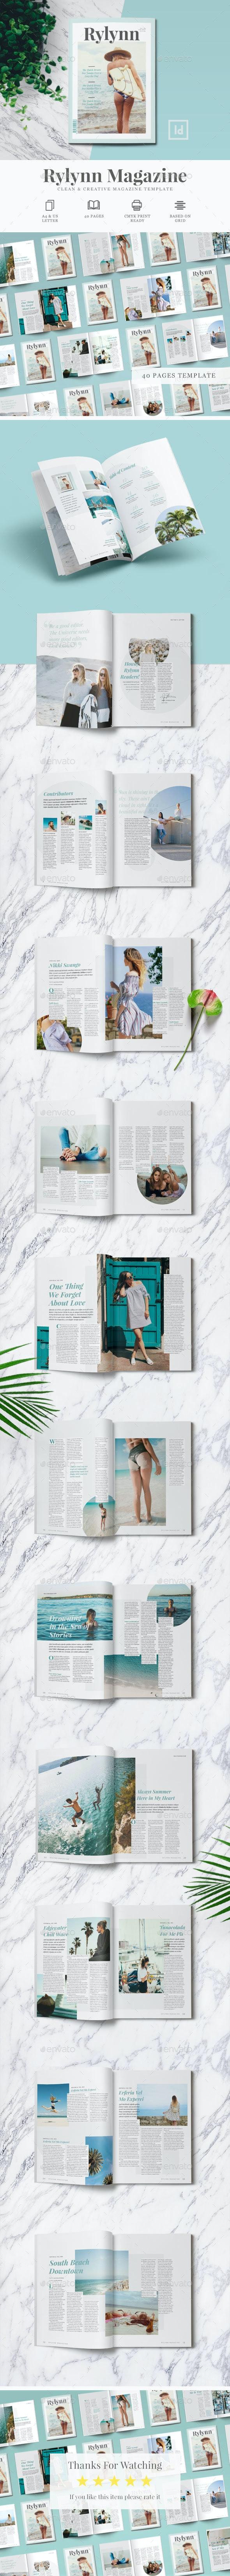 Rylynn Magazine - Magazines Print Templates